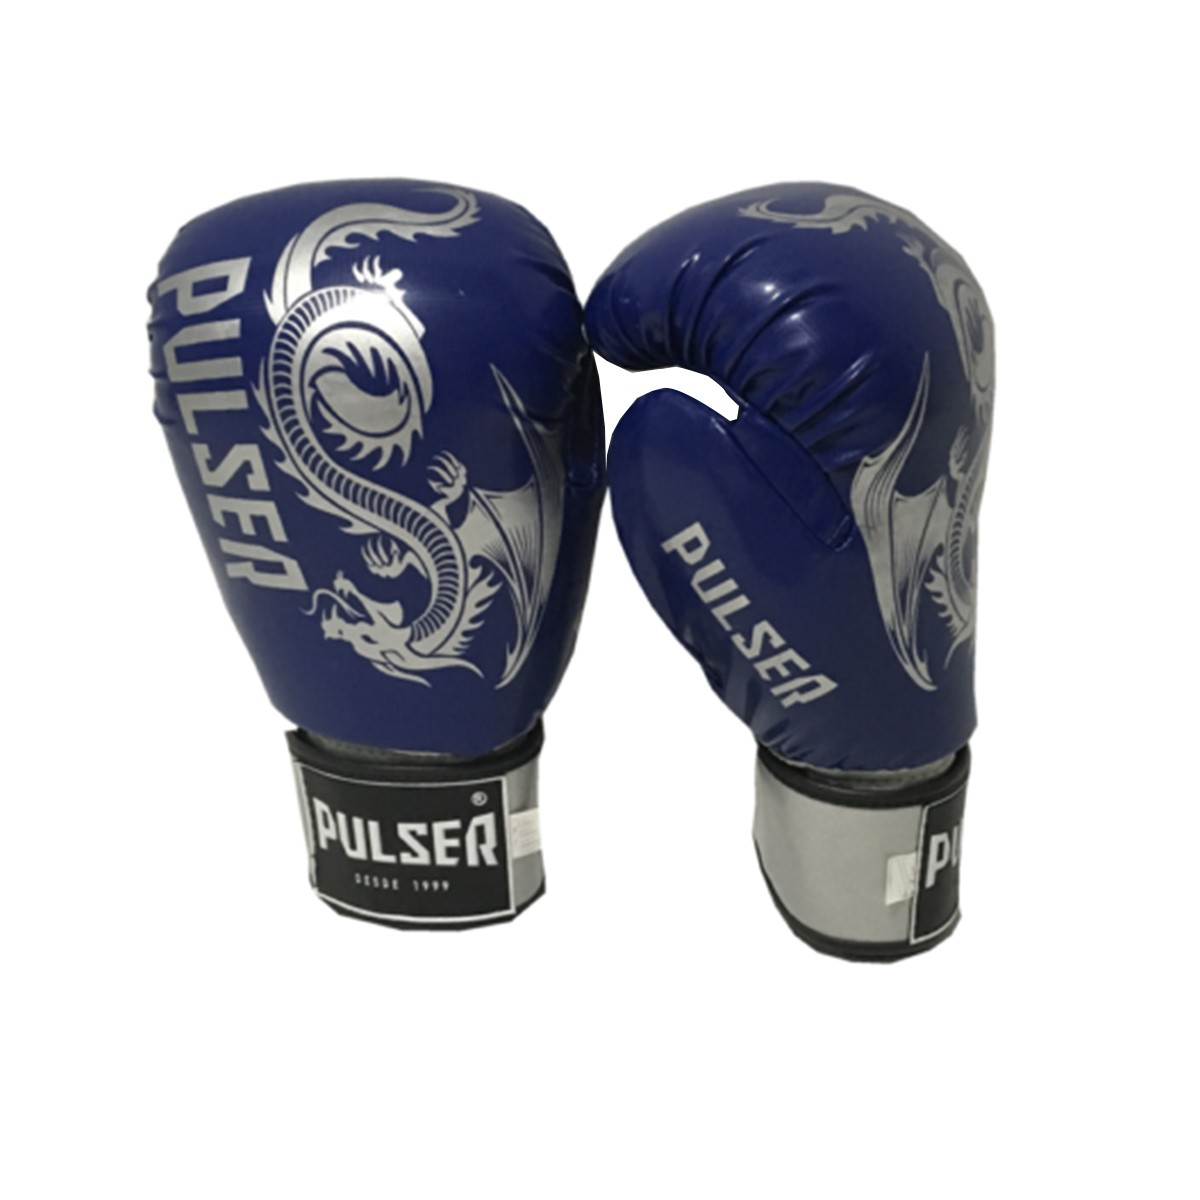 Luva de Boxe / Muay Thai 10oz - Dragão Azul Escuro - Pulser  - PRALUTA SHOP